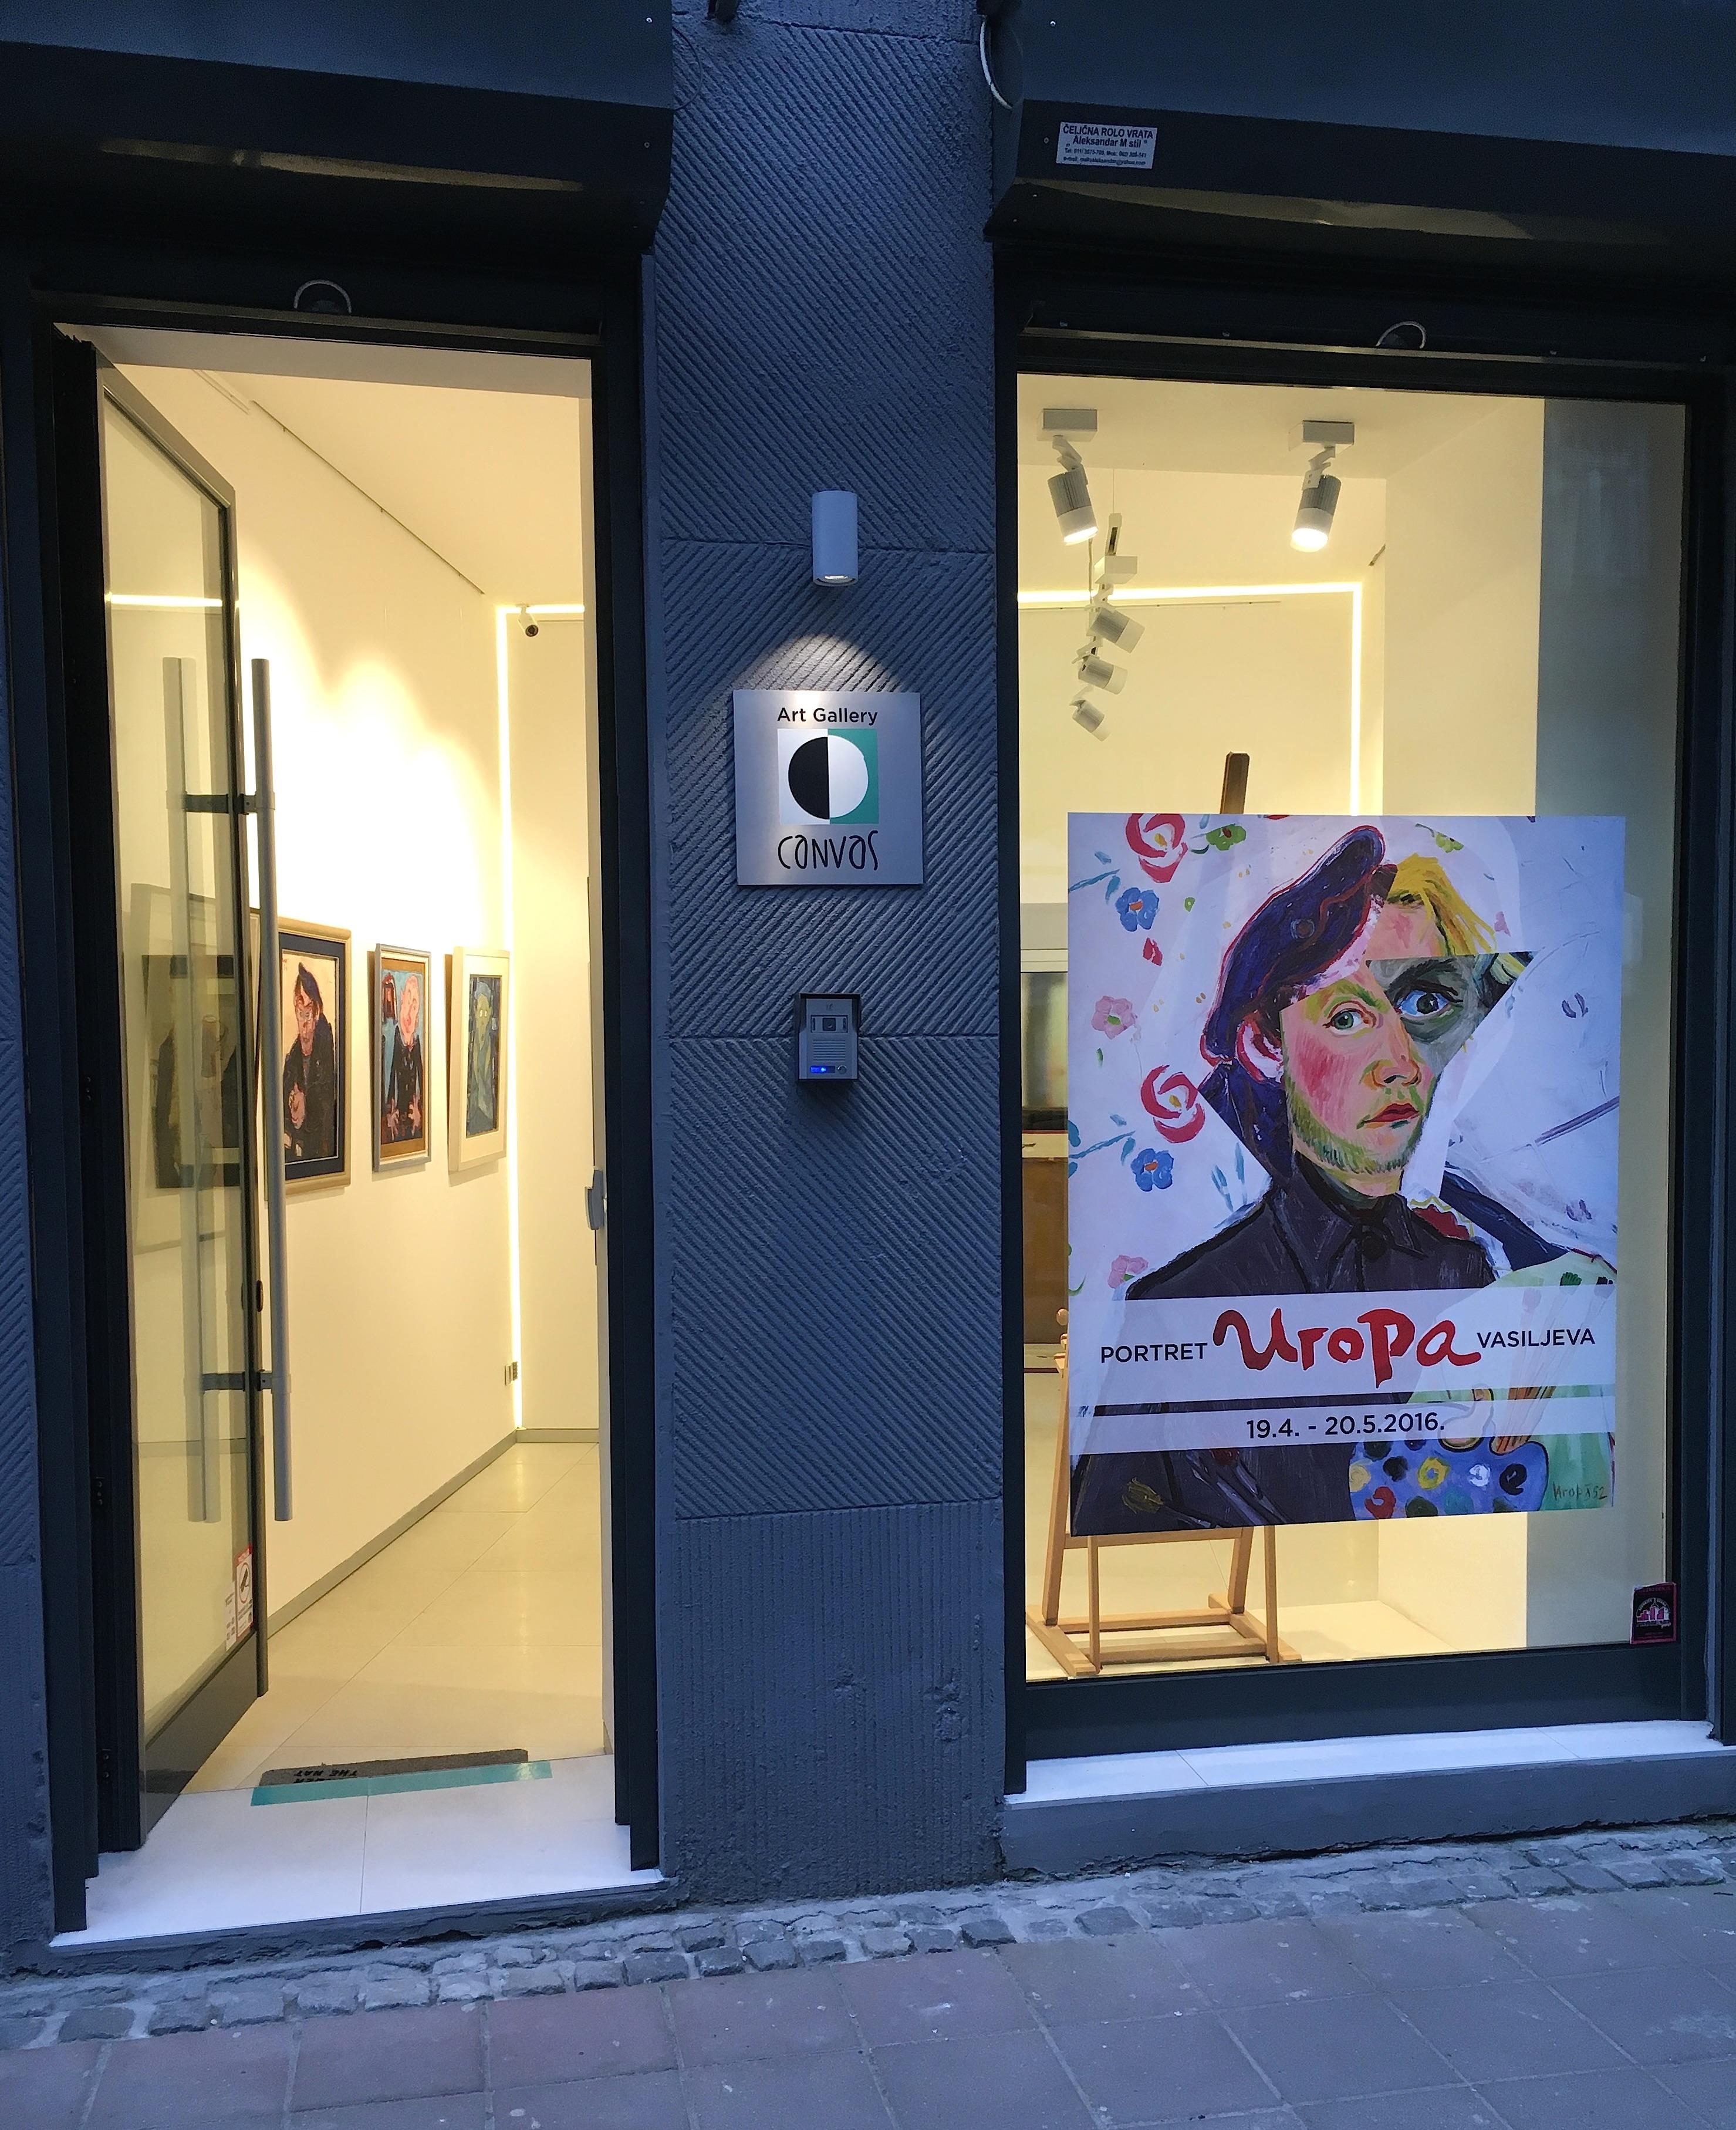 Art Gallery Canvas